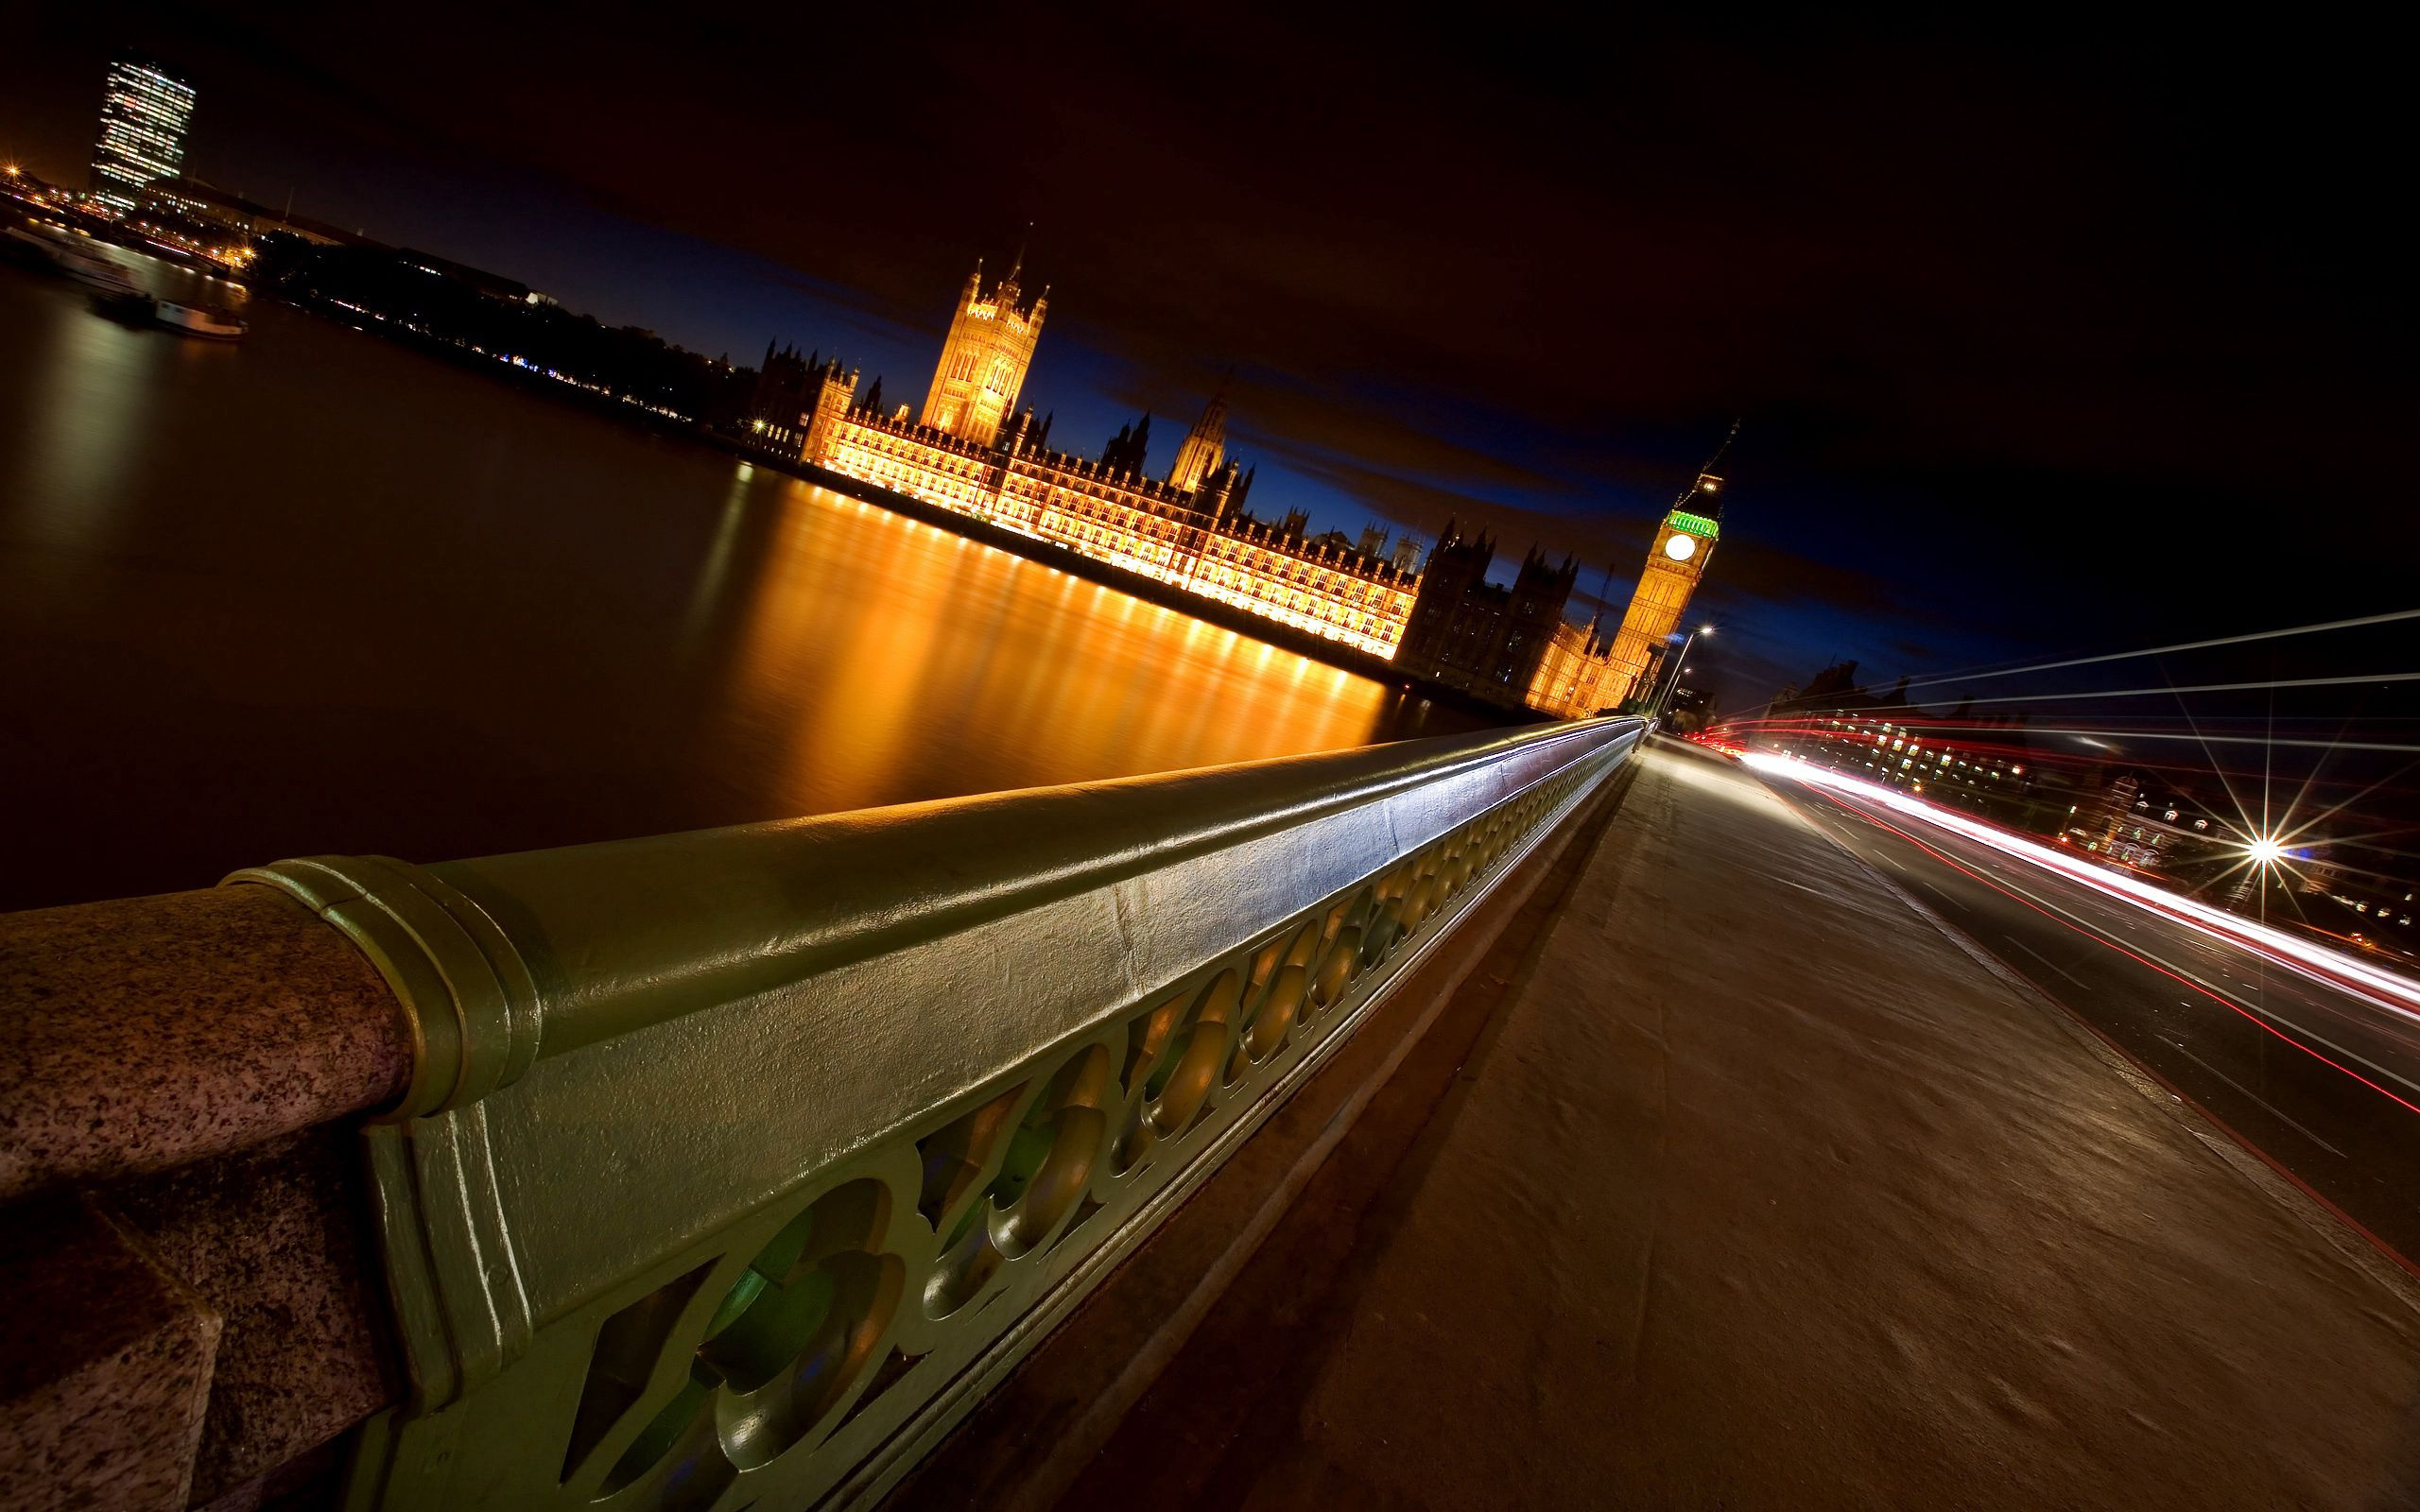 93936 download wallpaper London, Night, Bridge, Rivers, Big Ben, Cities screensavers and pictures for free